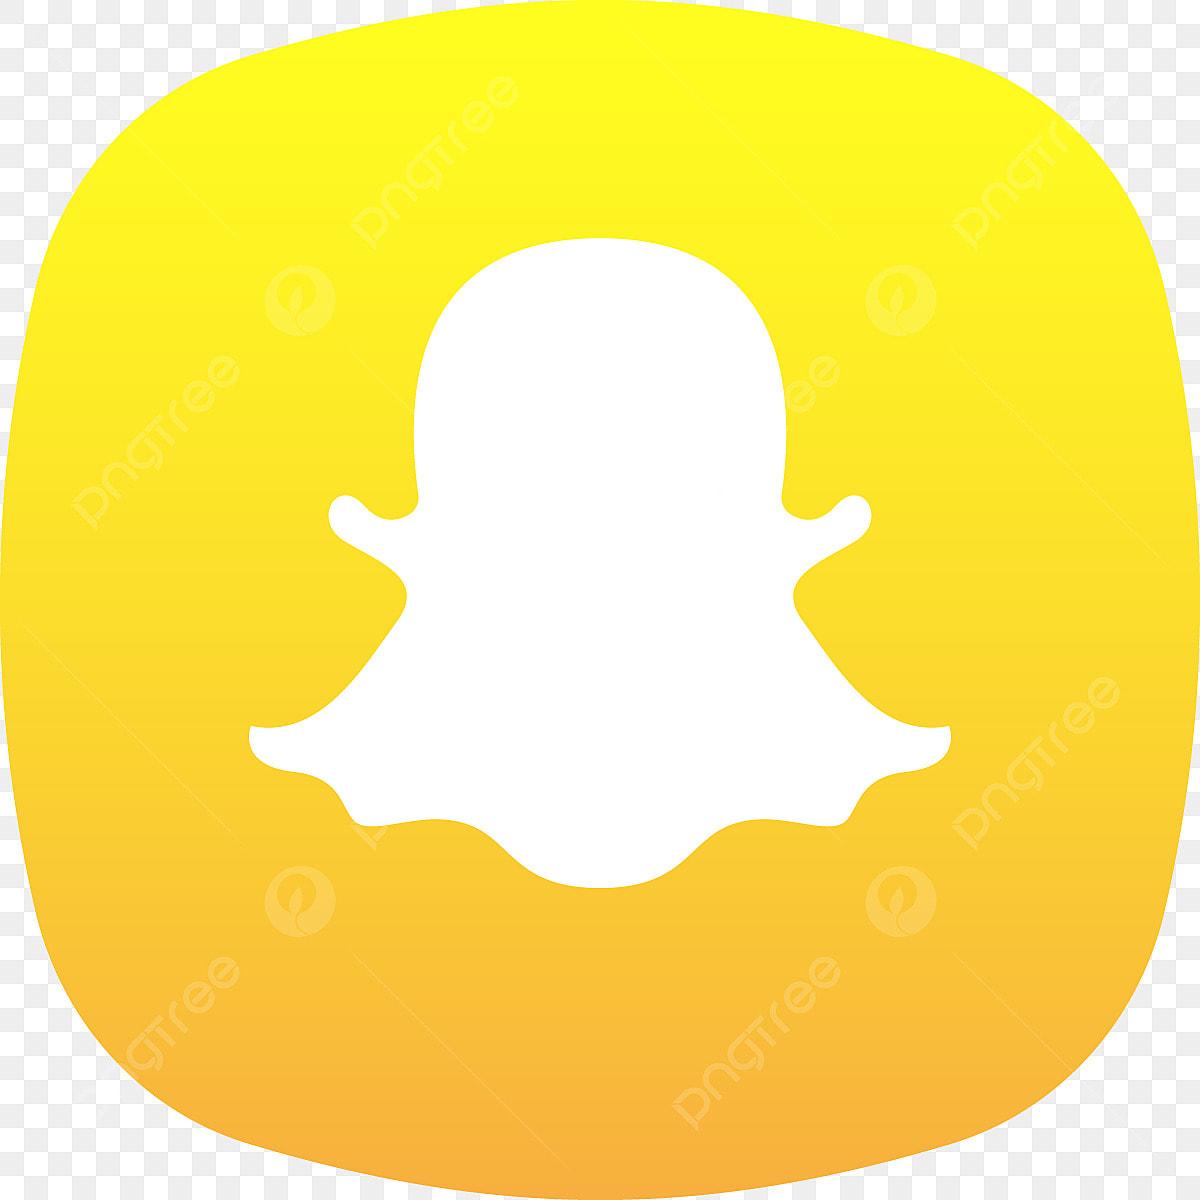 Snapchat أيقونة Png Snapchat الشعار سناب شات Snapchat رمز Snapchat الشعار Png والمتجهات للتحميل مجانا